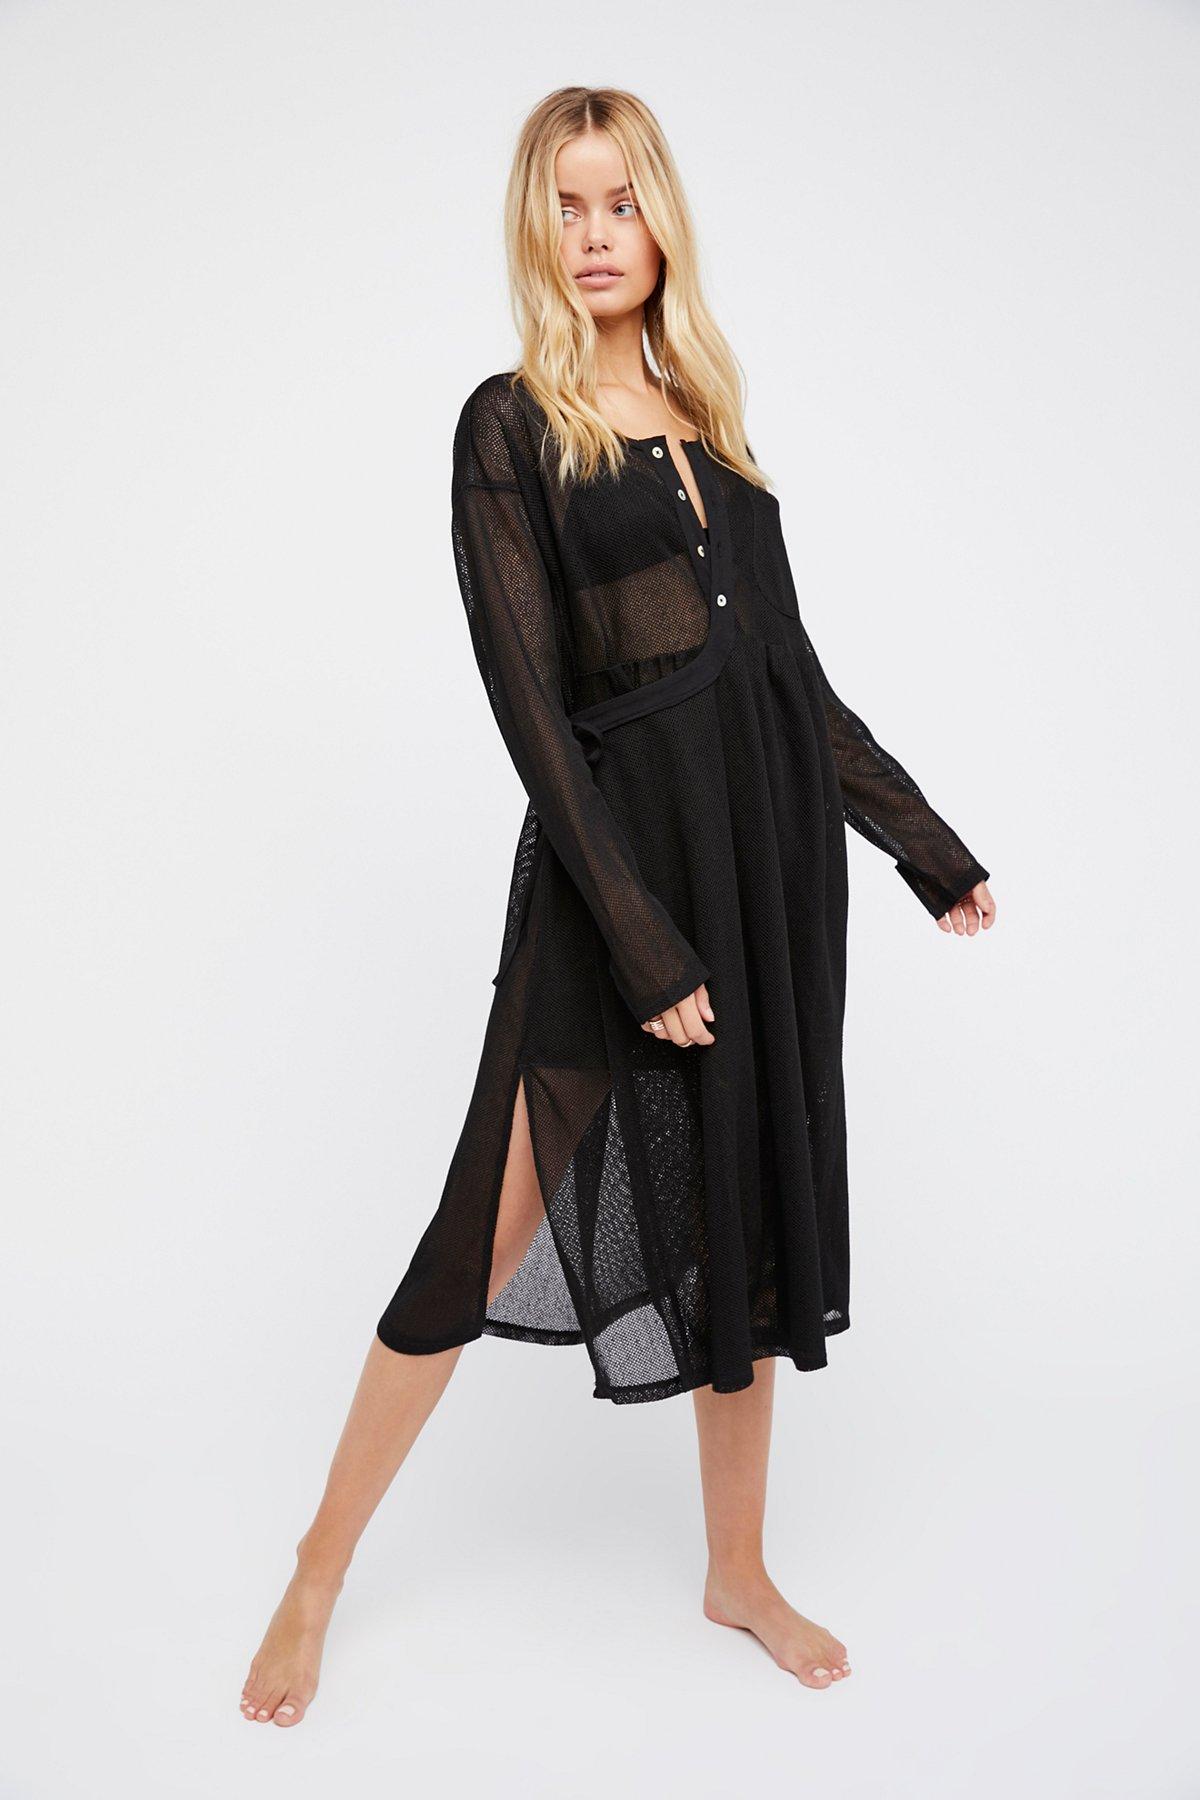 Sunday Market纯色网纱连衣裙